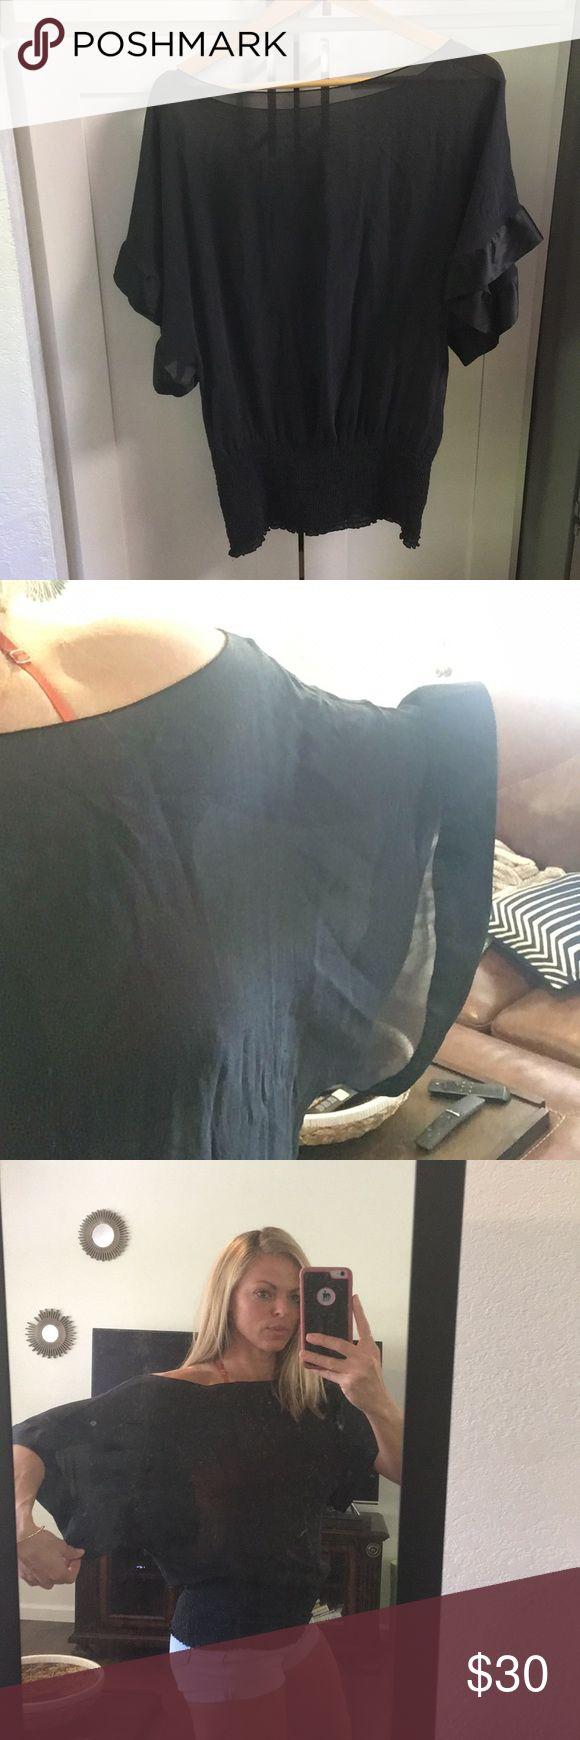 Silk Top • M Sheer silk Top. Bell sleeves. Elastic waist flattens tummy and gives smaller waist elusion. Diane Von Furstenberg Tops Tunics